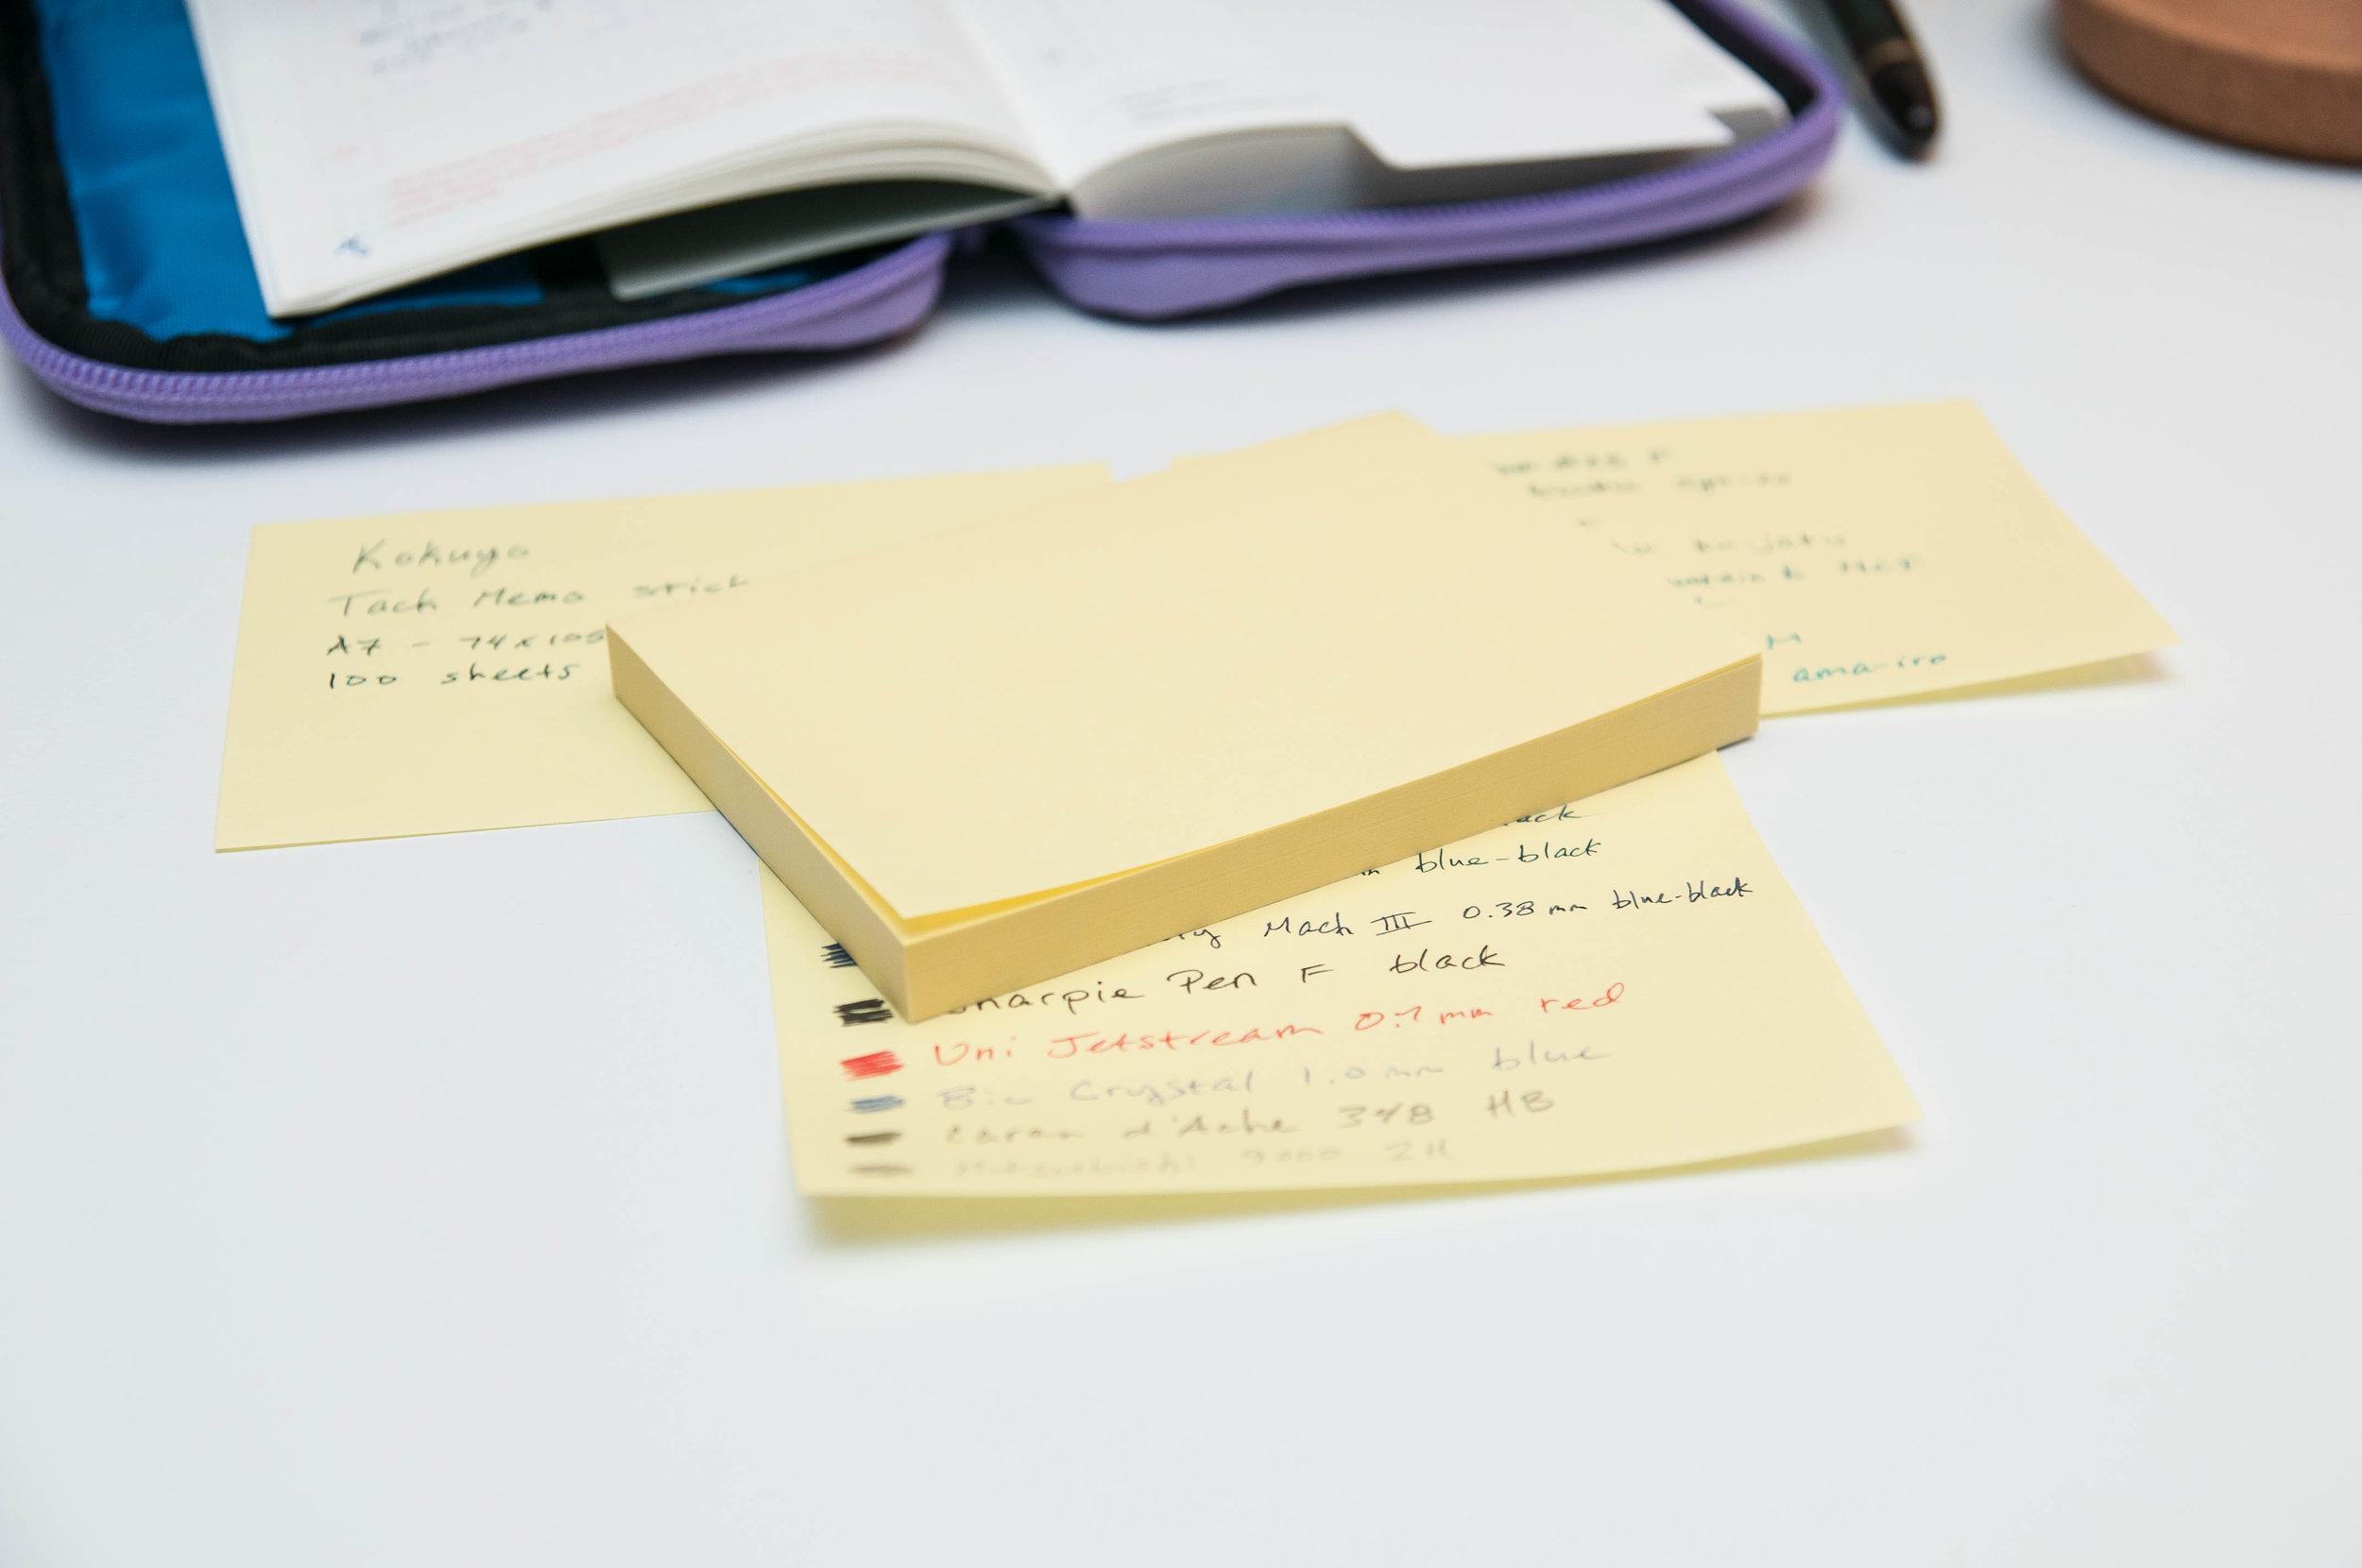 Kokuyo Tack Memo Sticky Notes